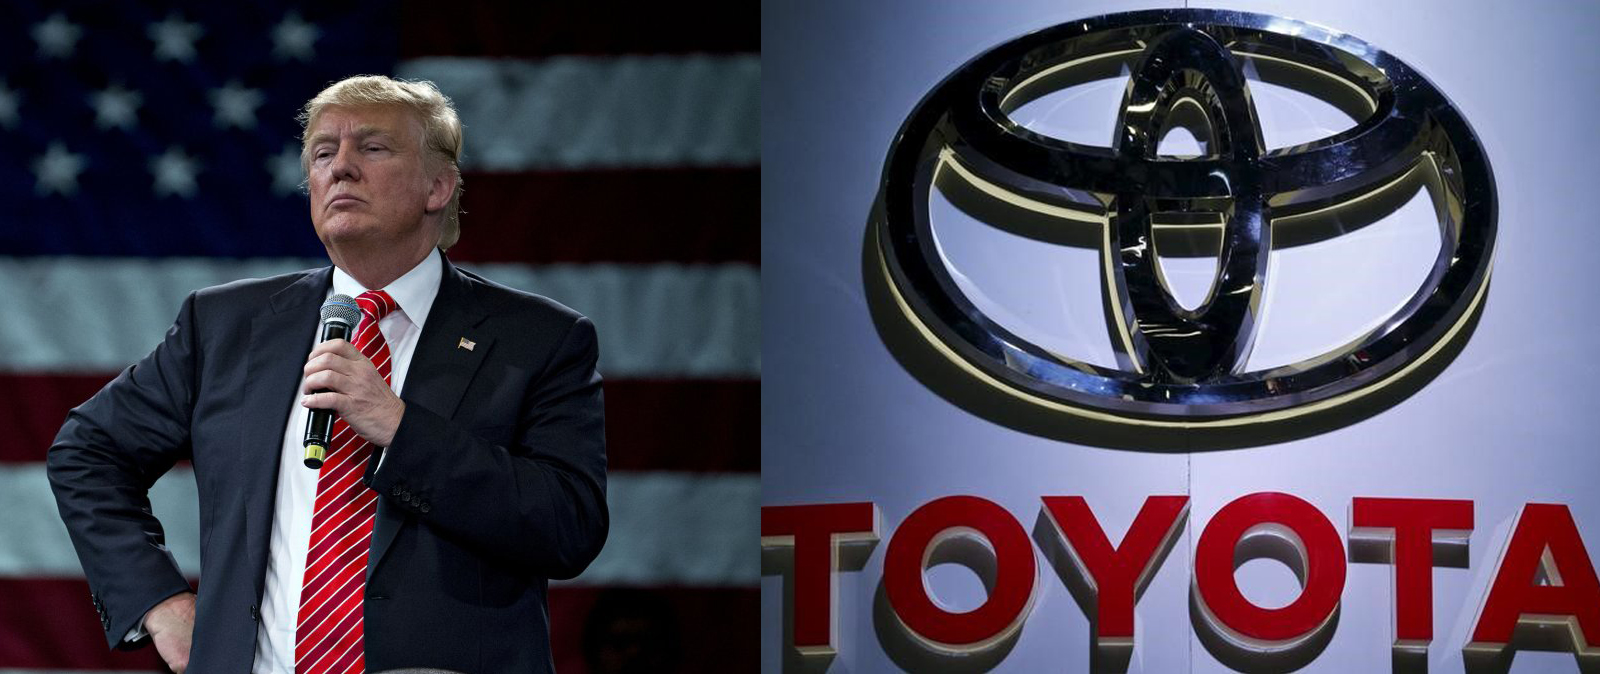 Toyota shares fall following Trump's tariff threat